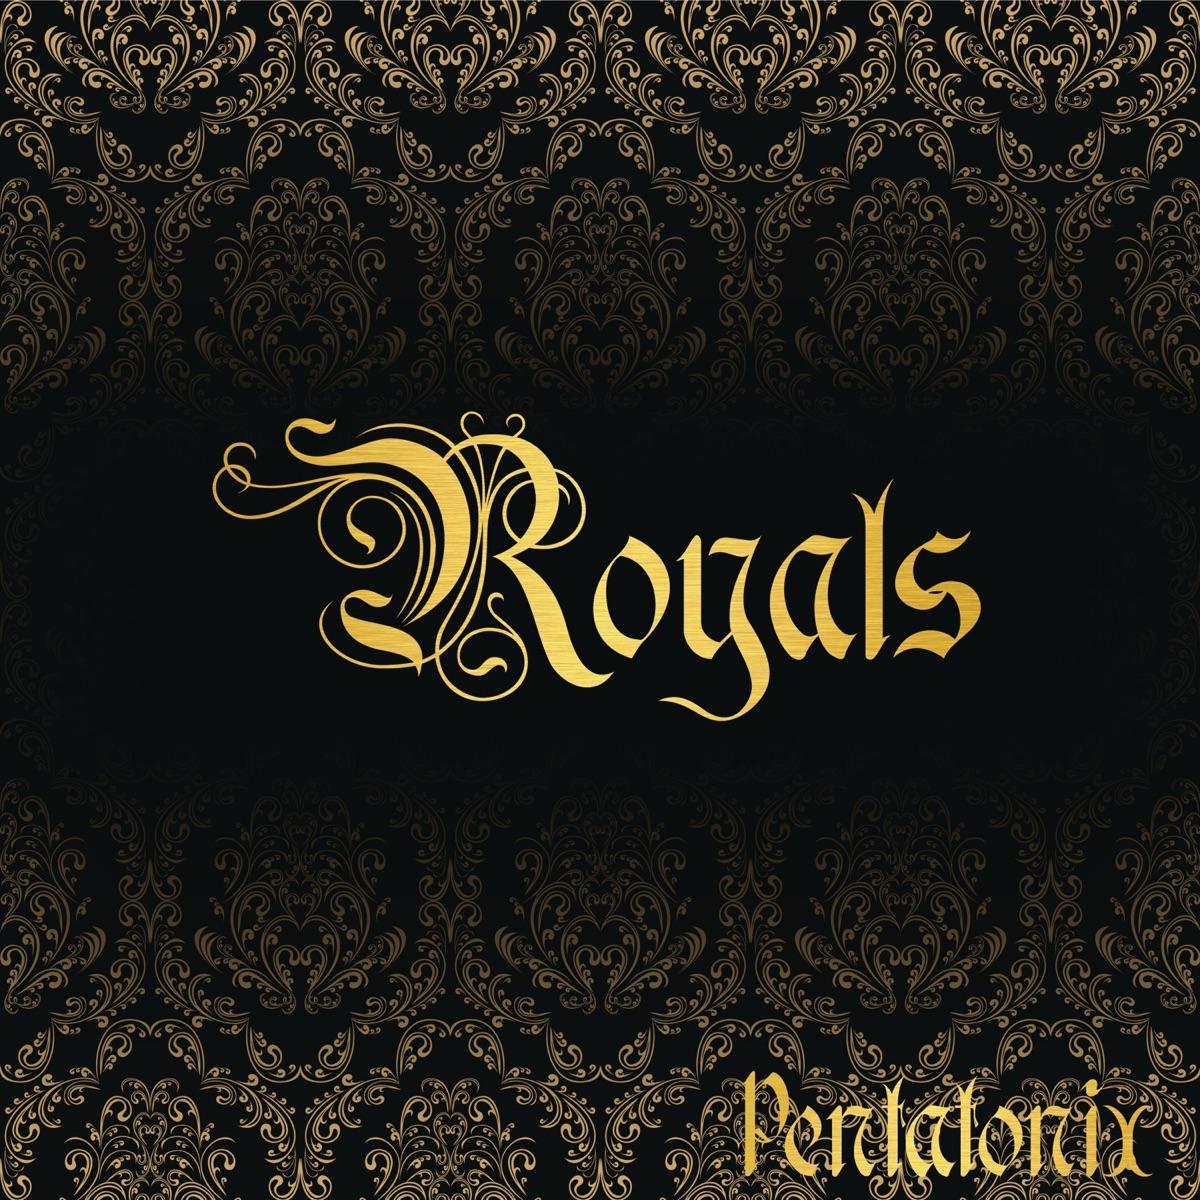 iii ep ptxmas deluxe edition